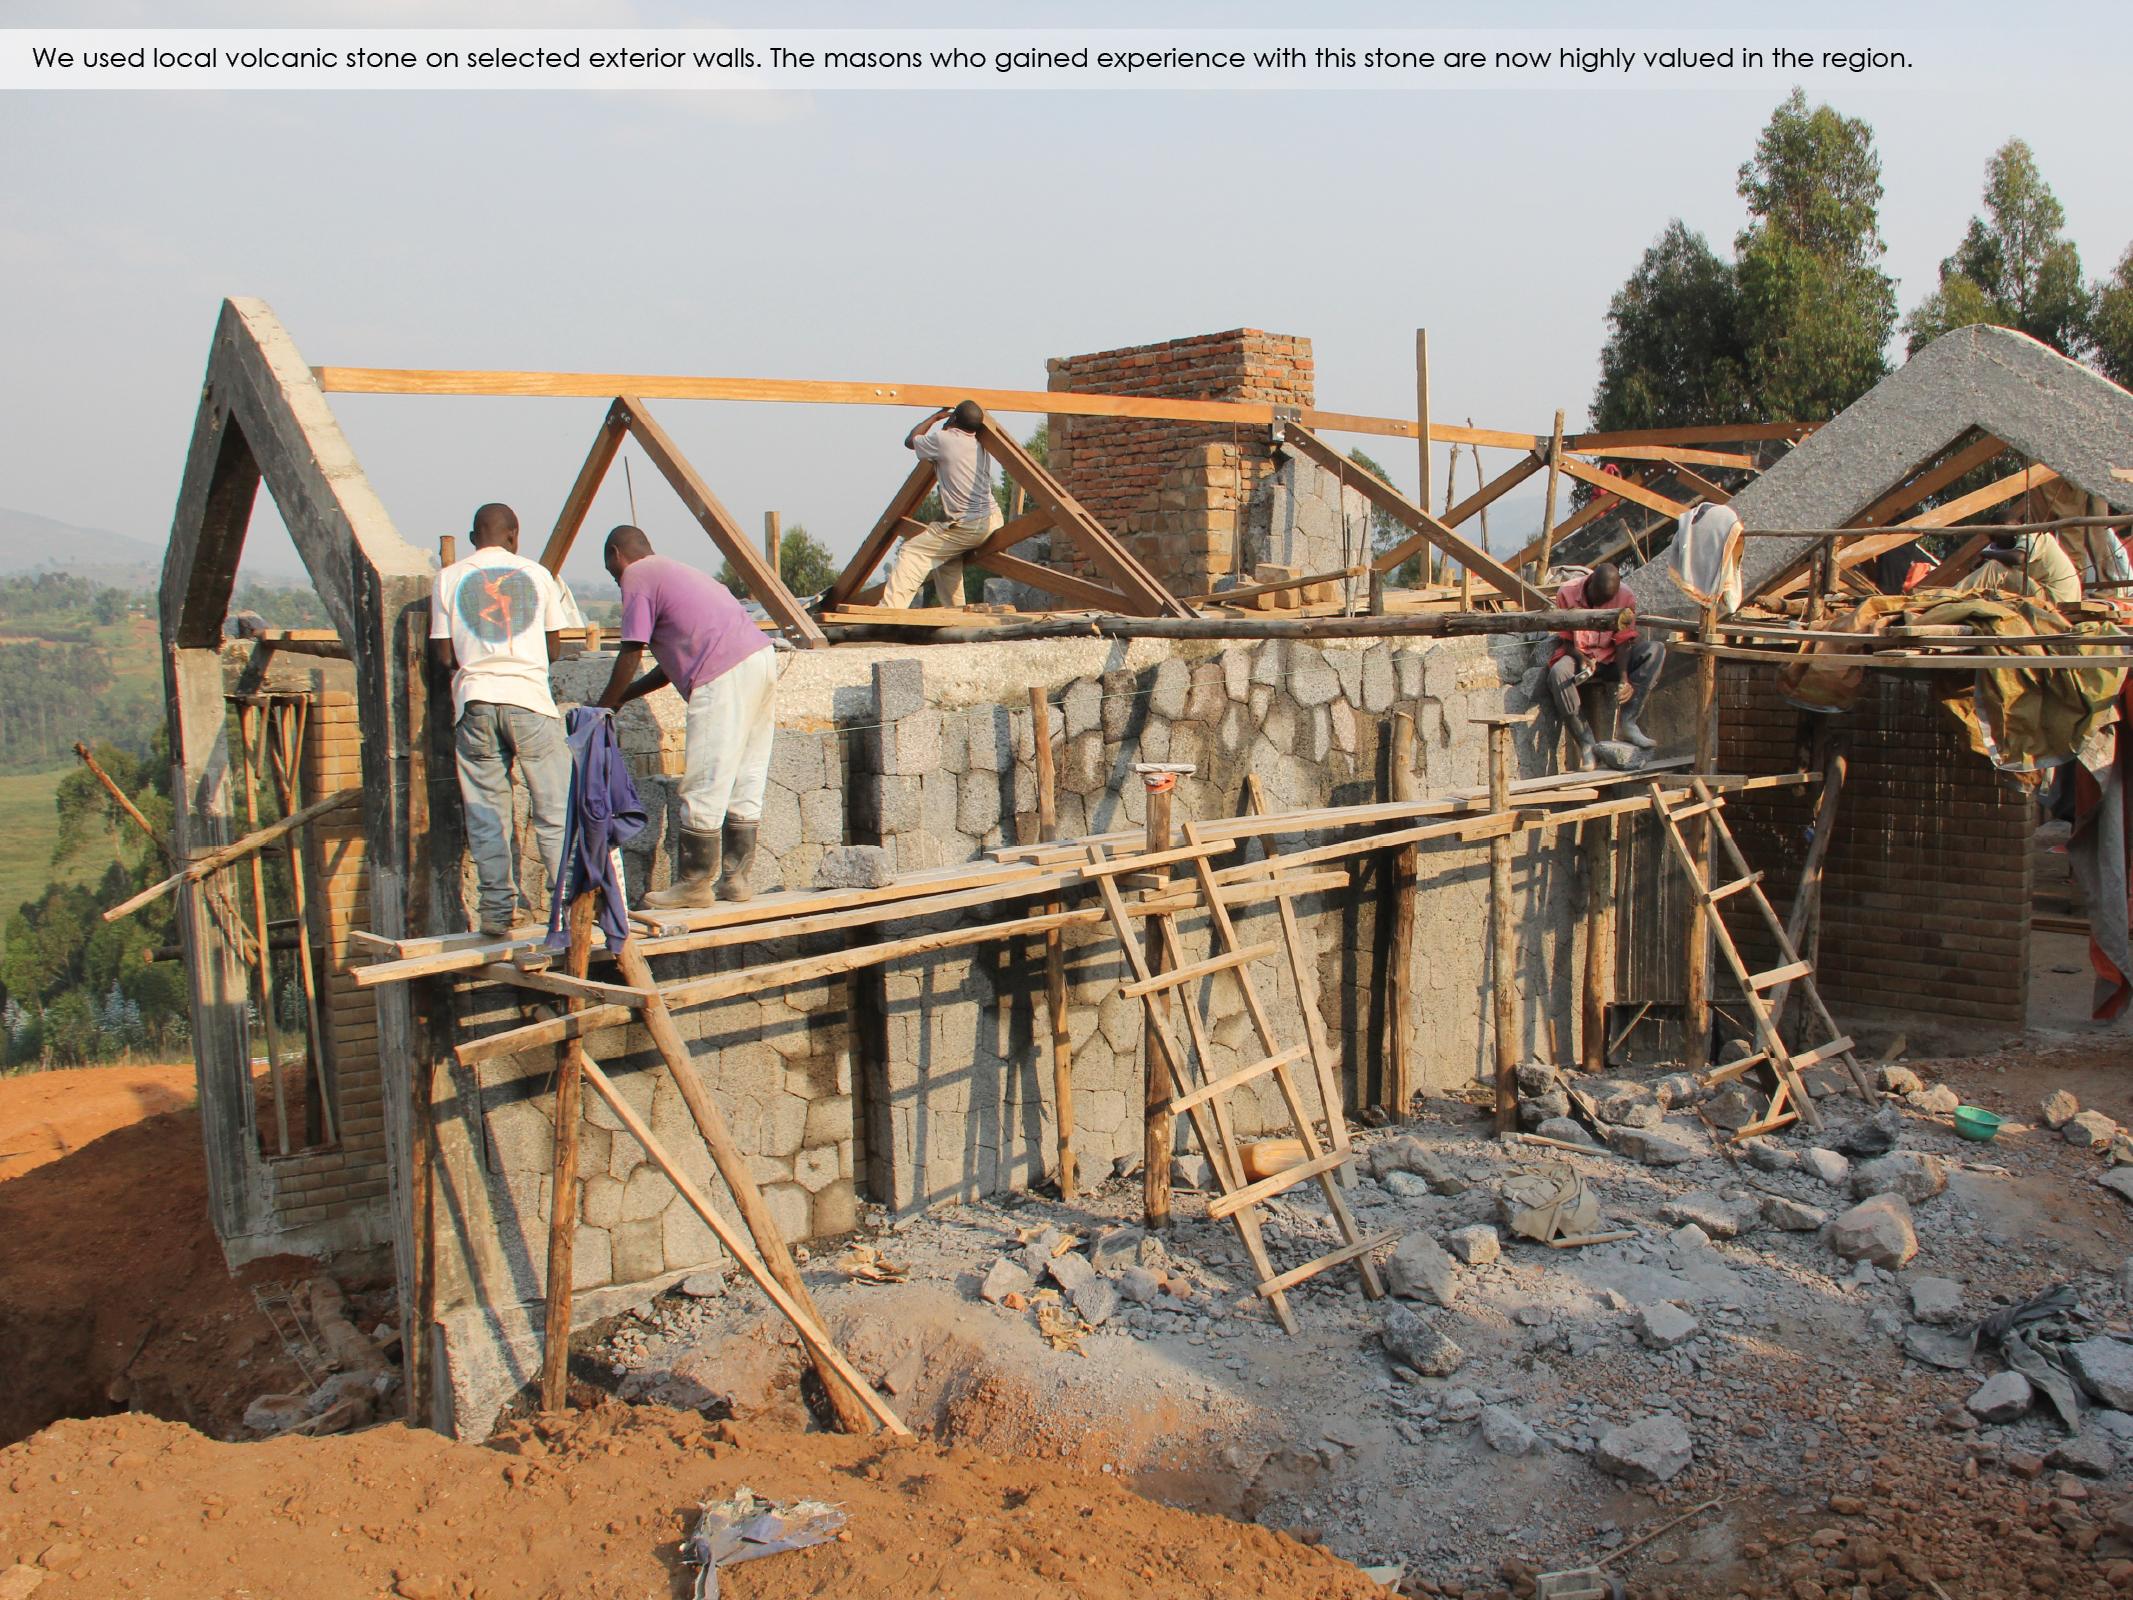 Gaugler_RwandaExperience_p28.jpg